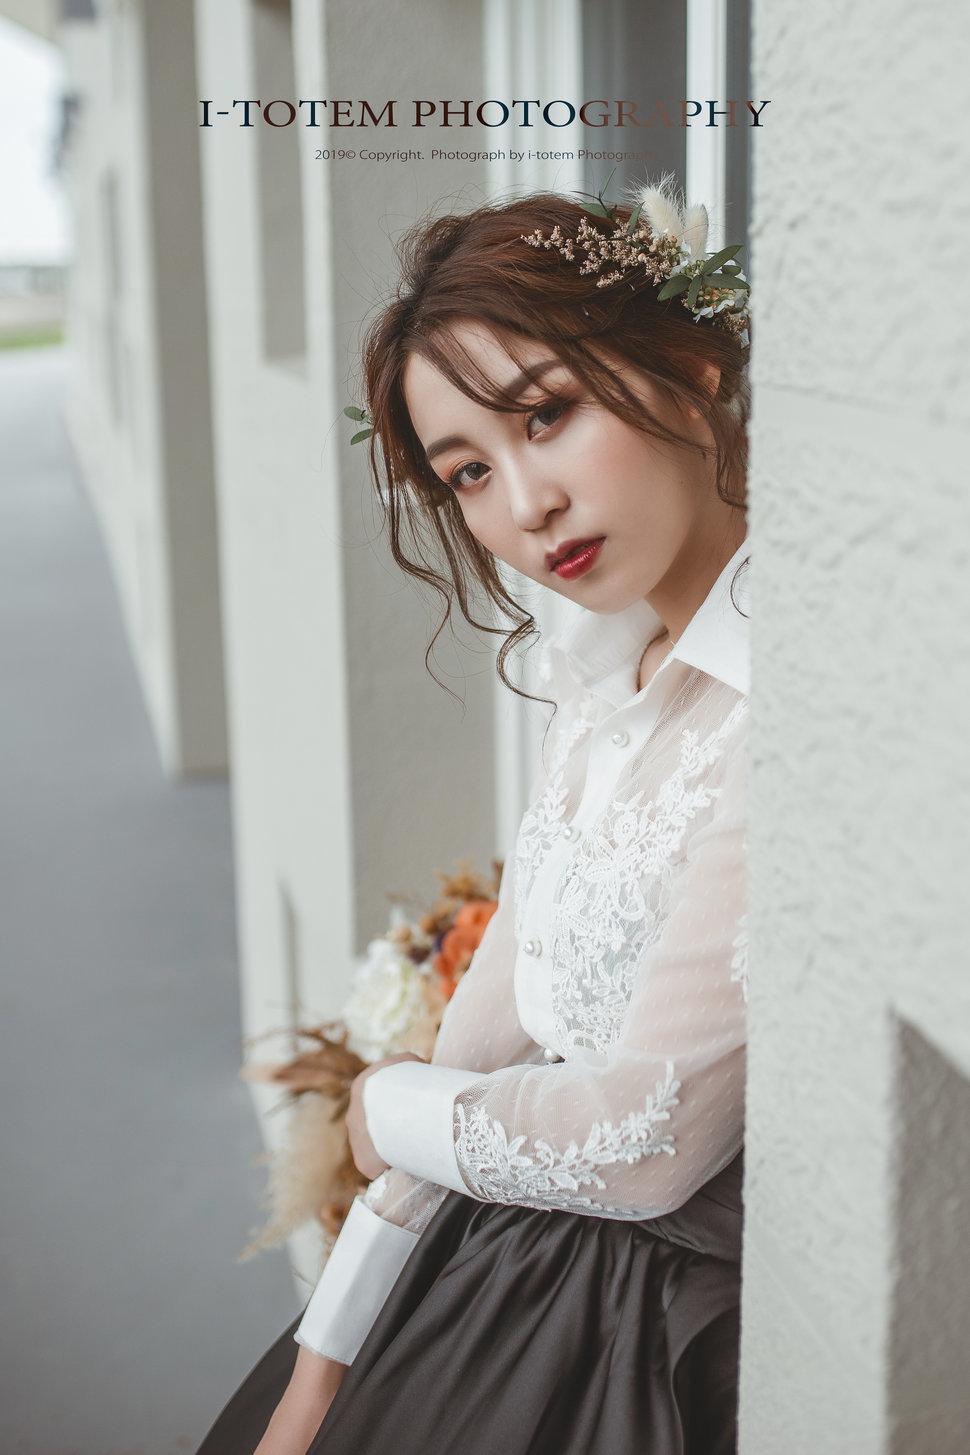 DSC02609 - Zona時尚美甲x新娘秘書整體造型工作室《結婚吧》